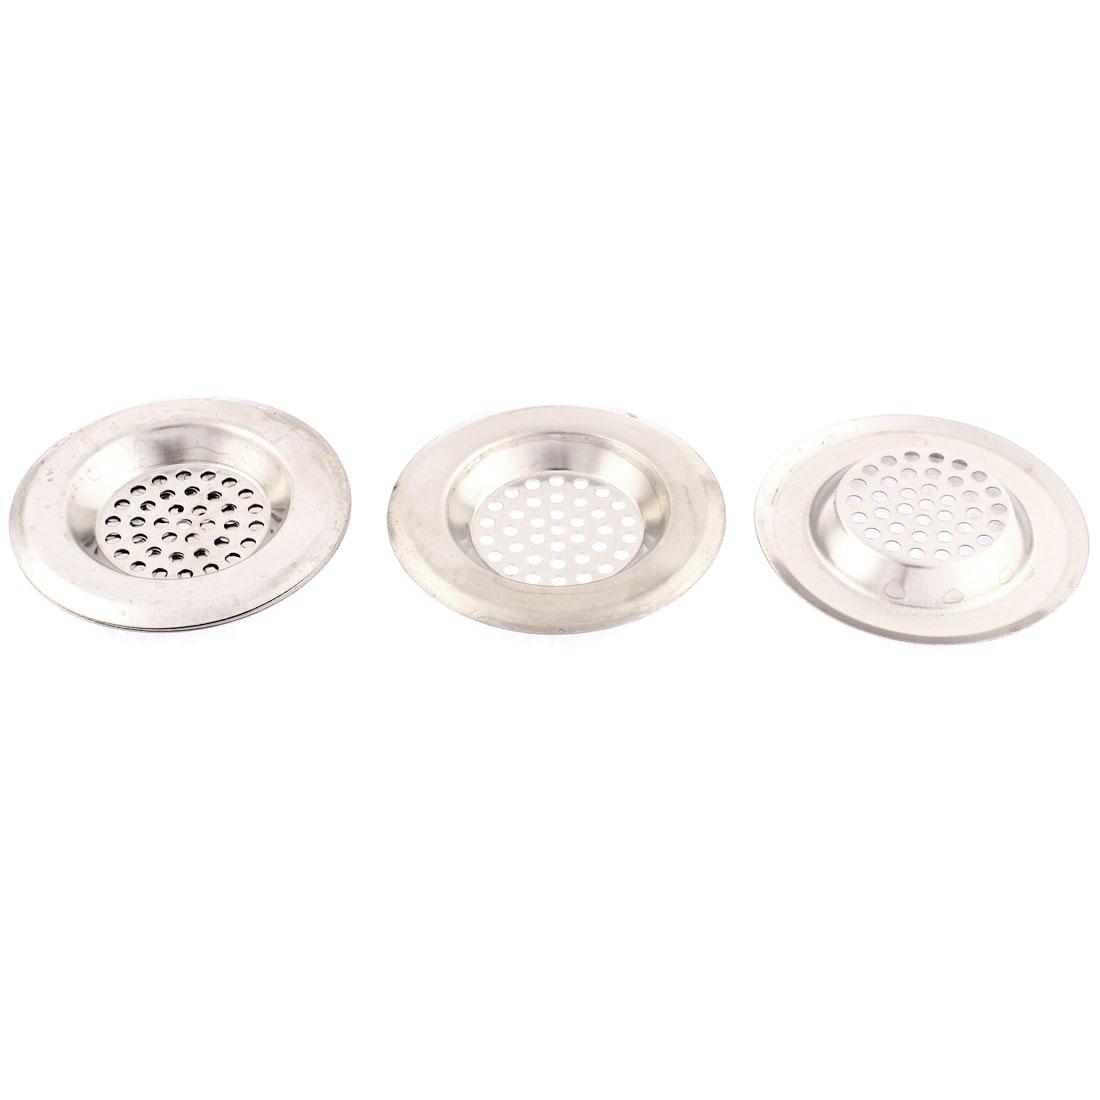 Kitchen Bathroom Metal Sink Basin Hair Waste Filter Strainer Drainer Stopper 5pcs